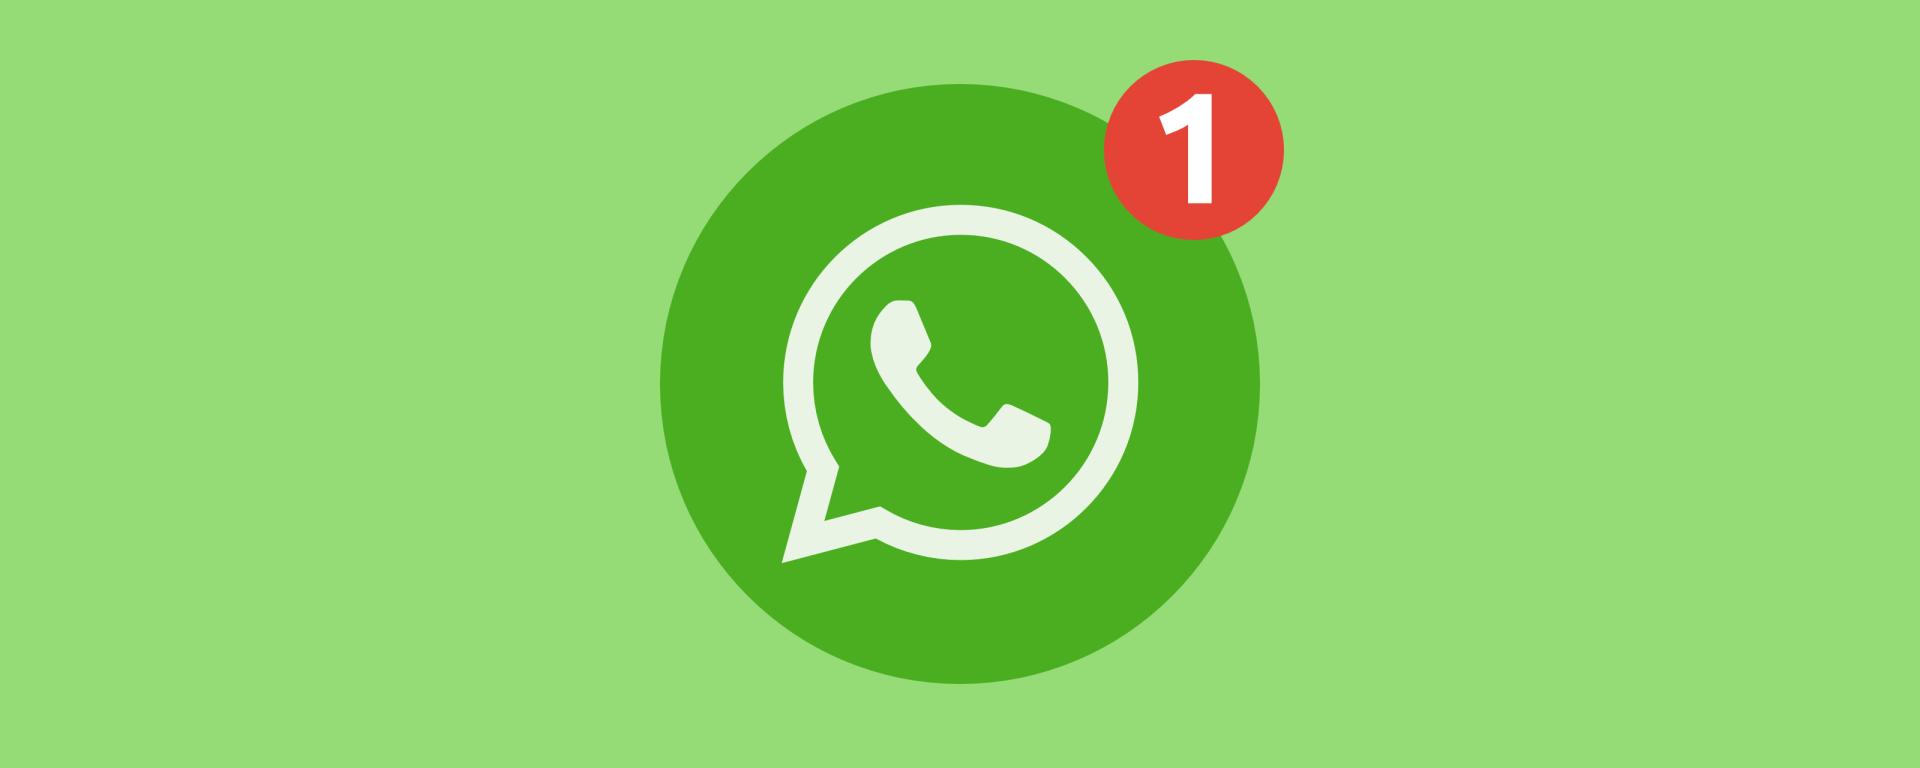 Whatsapp-Permanencias-Voluntarias